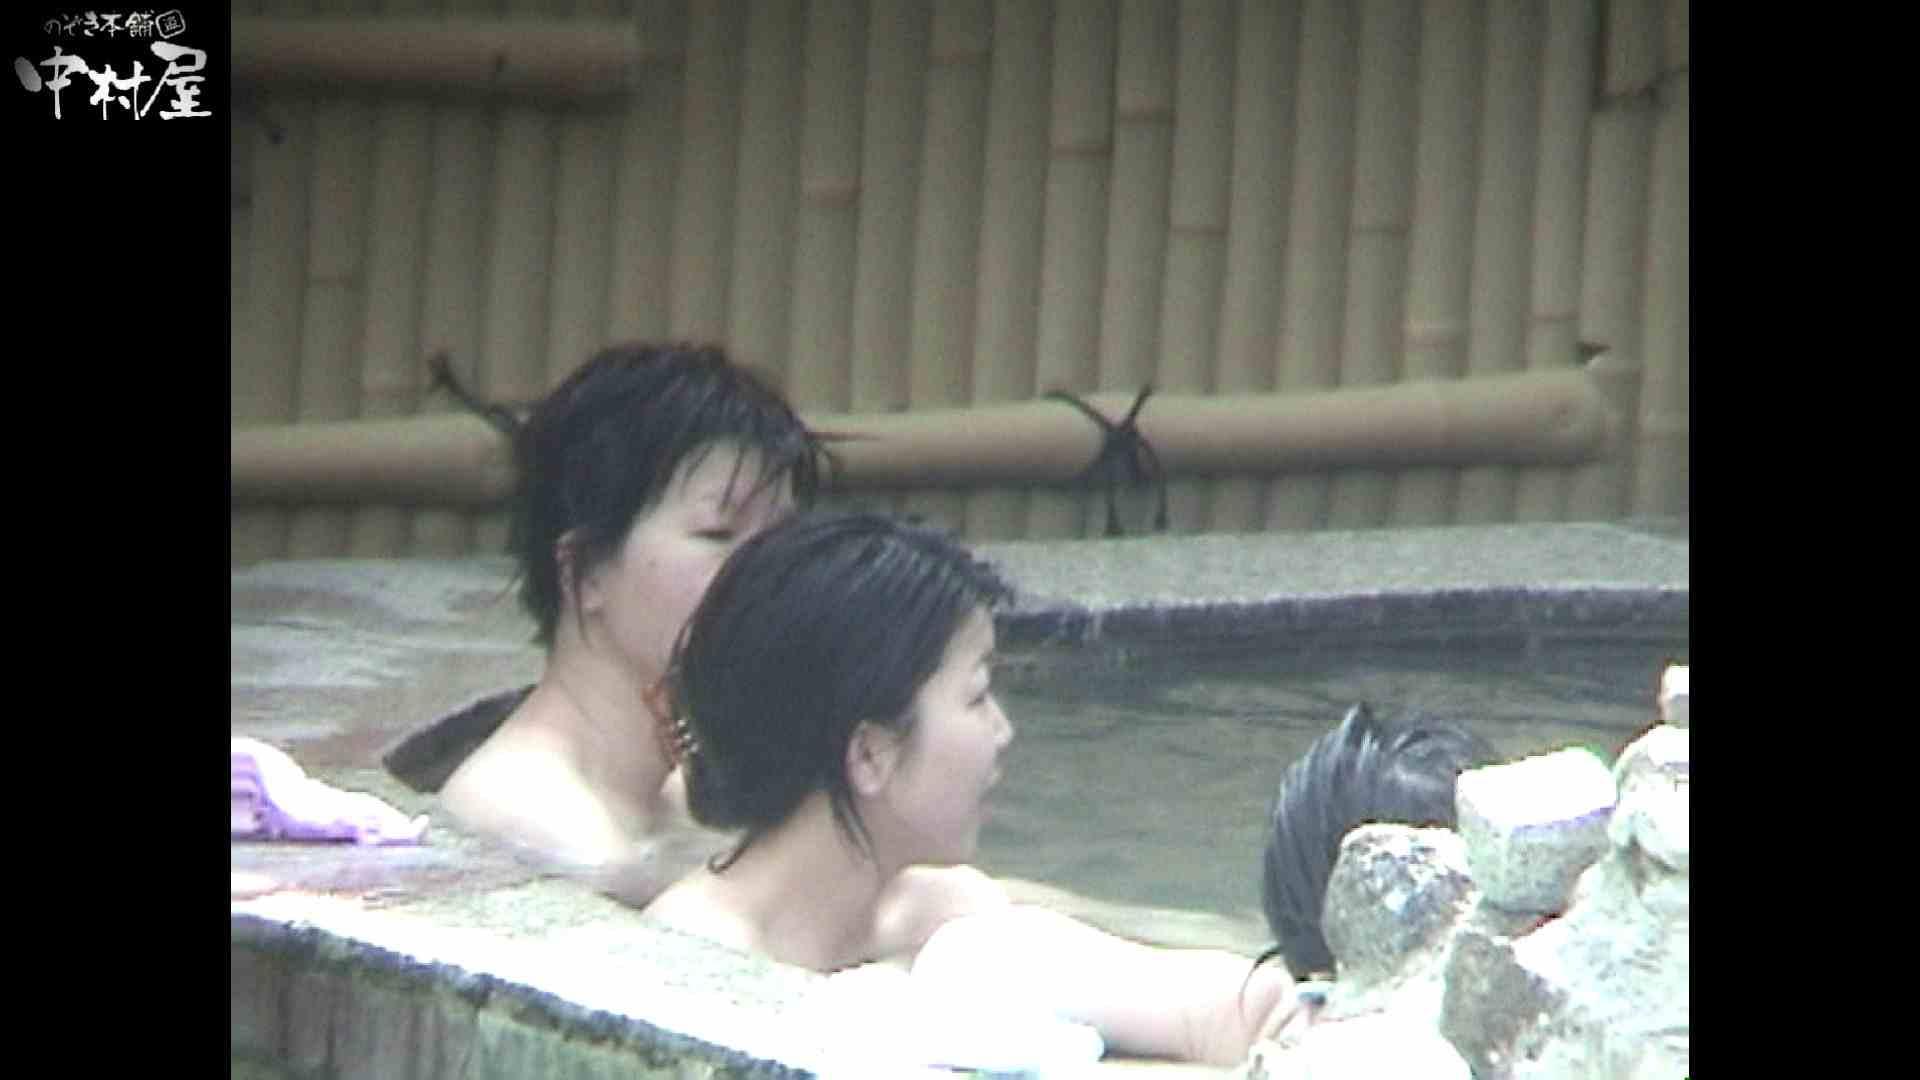 Aquaな露天風呂Vol.936 盗撮大放出 AV無料 85連発 43